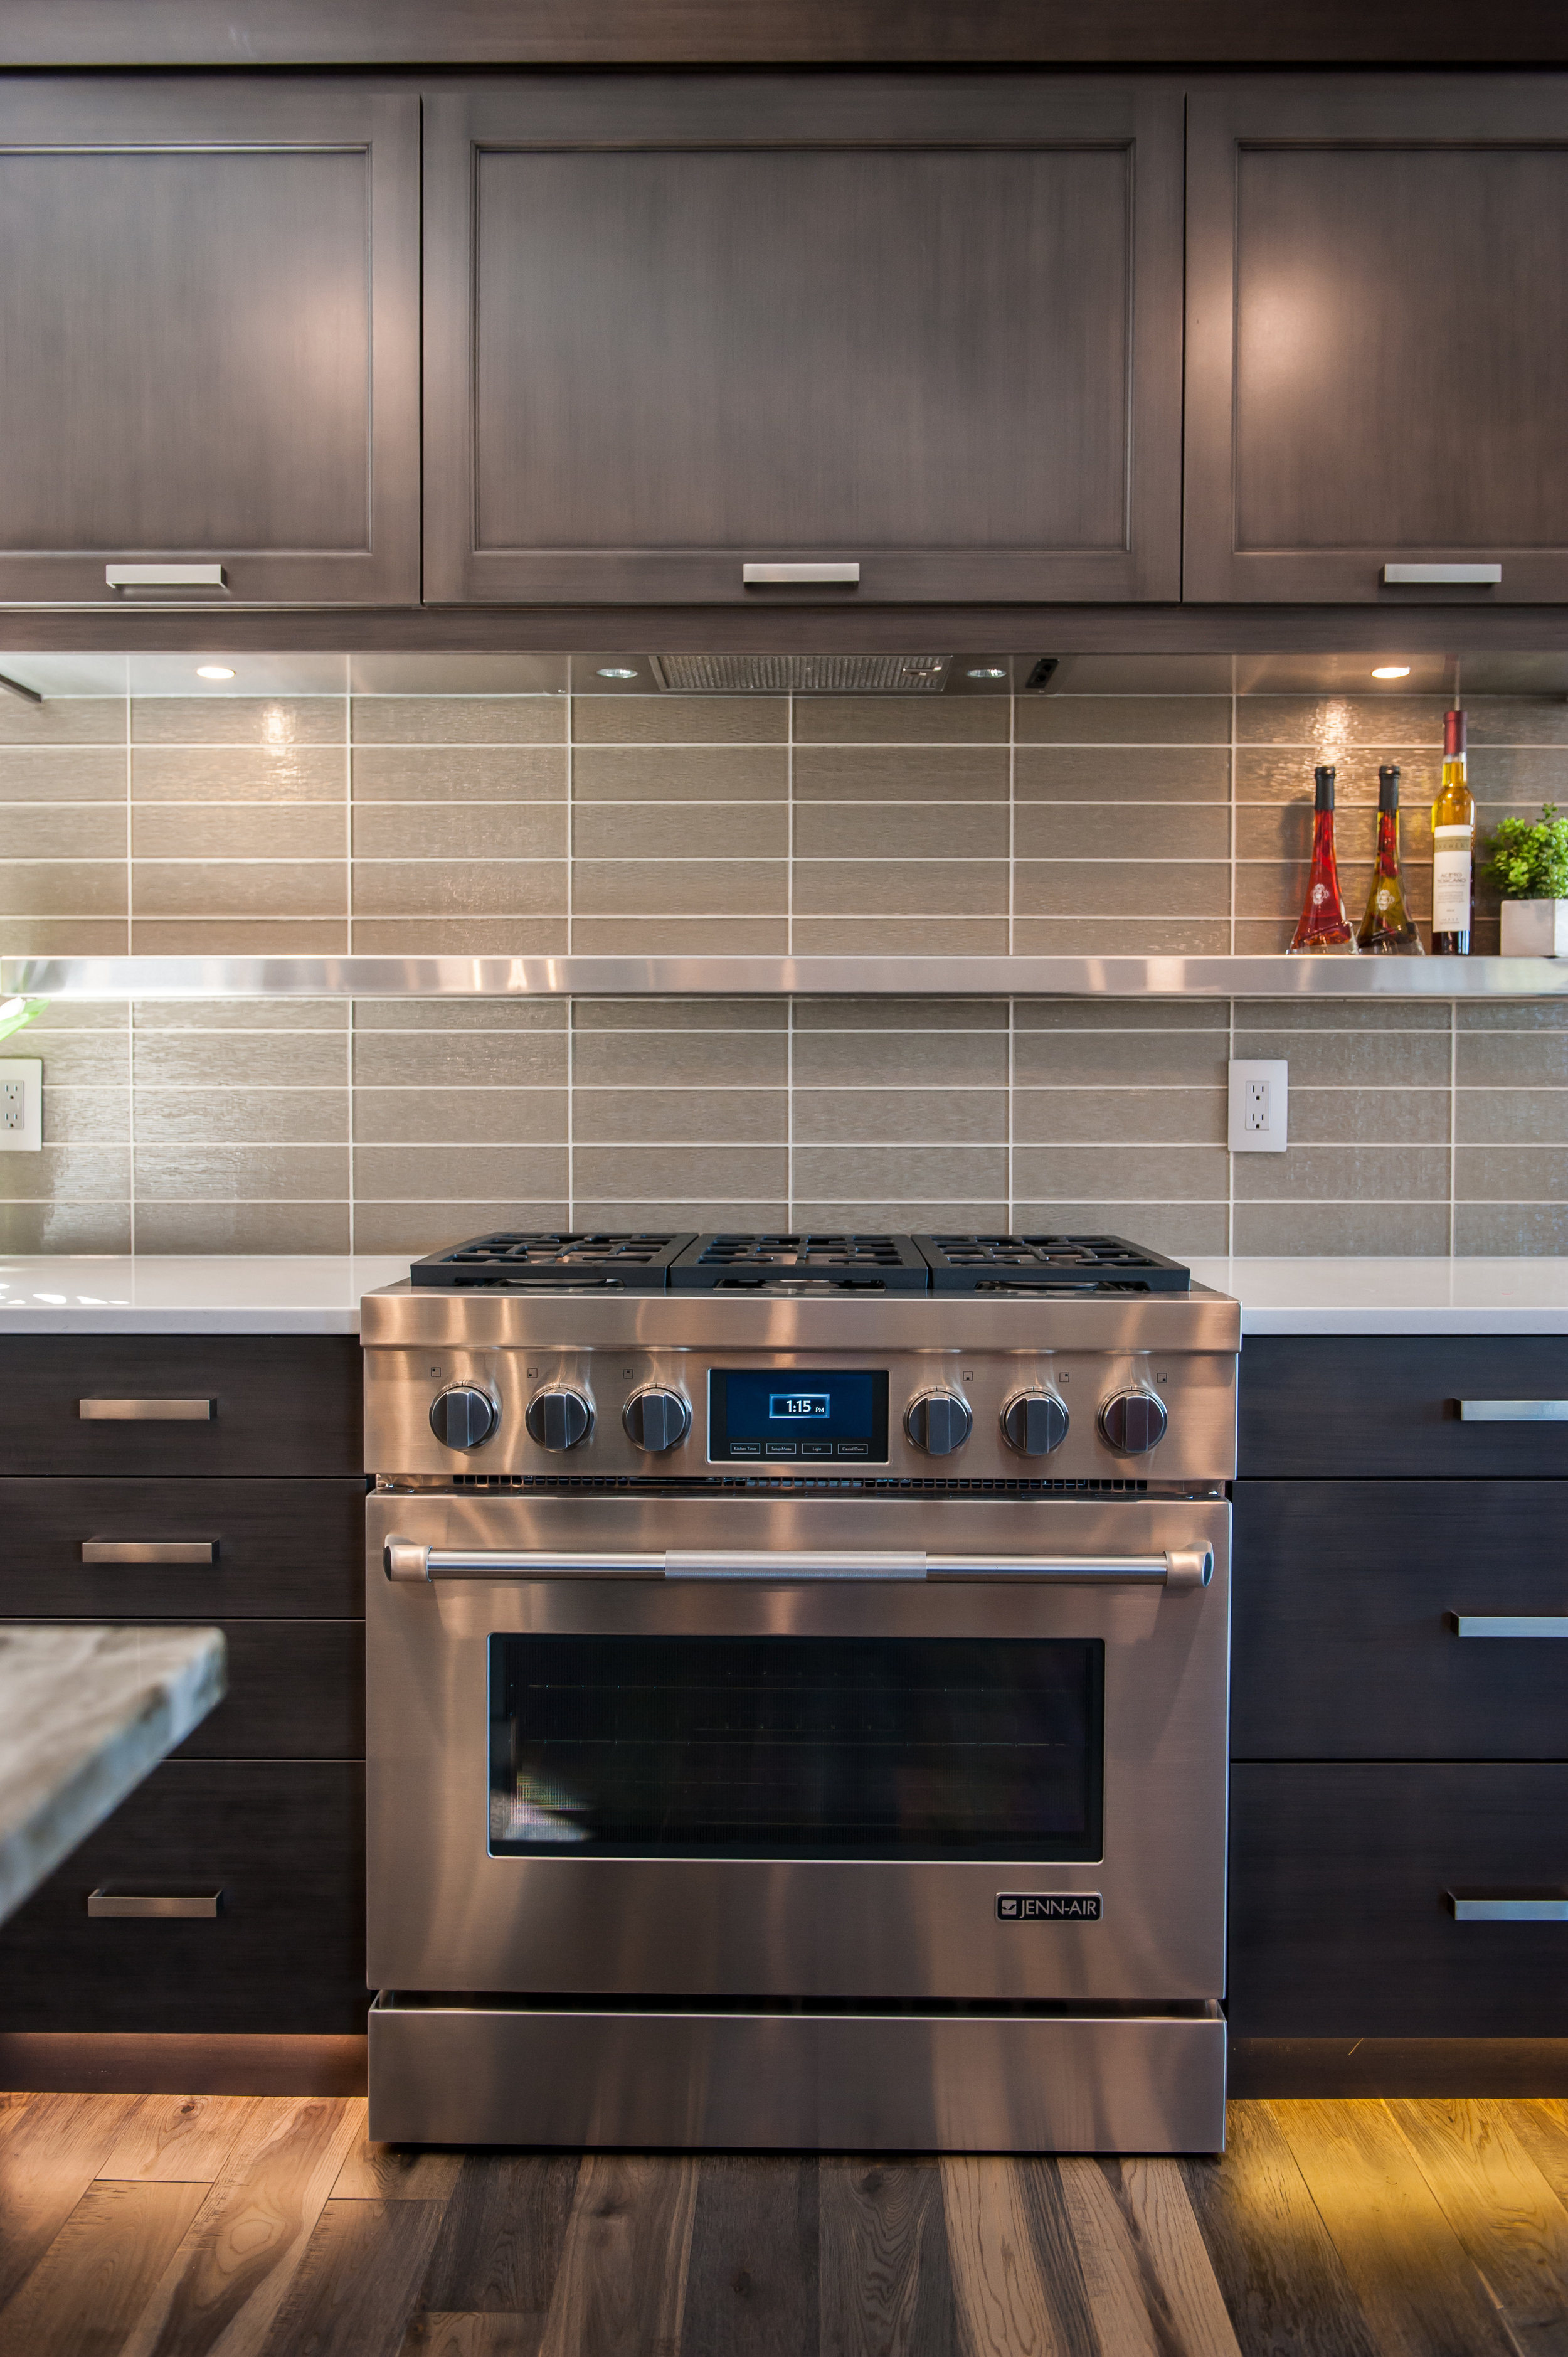 oven kitchen stainless